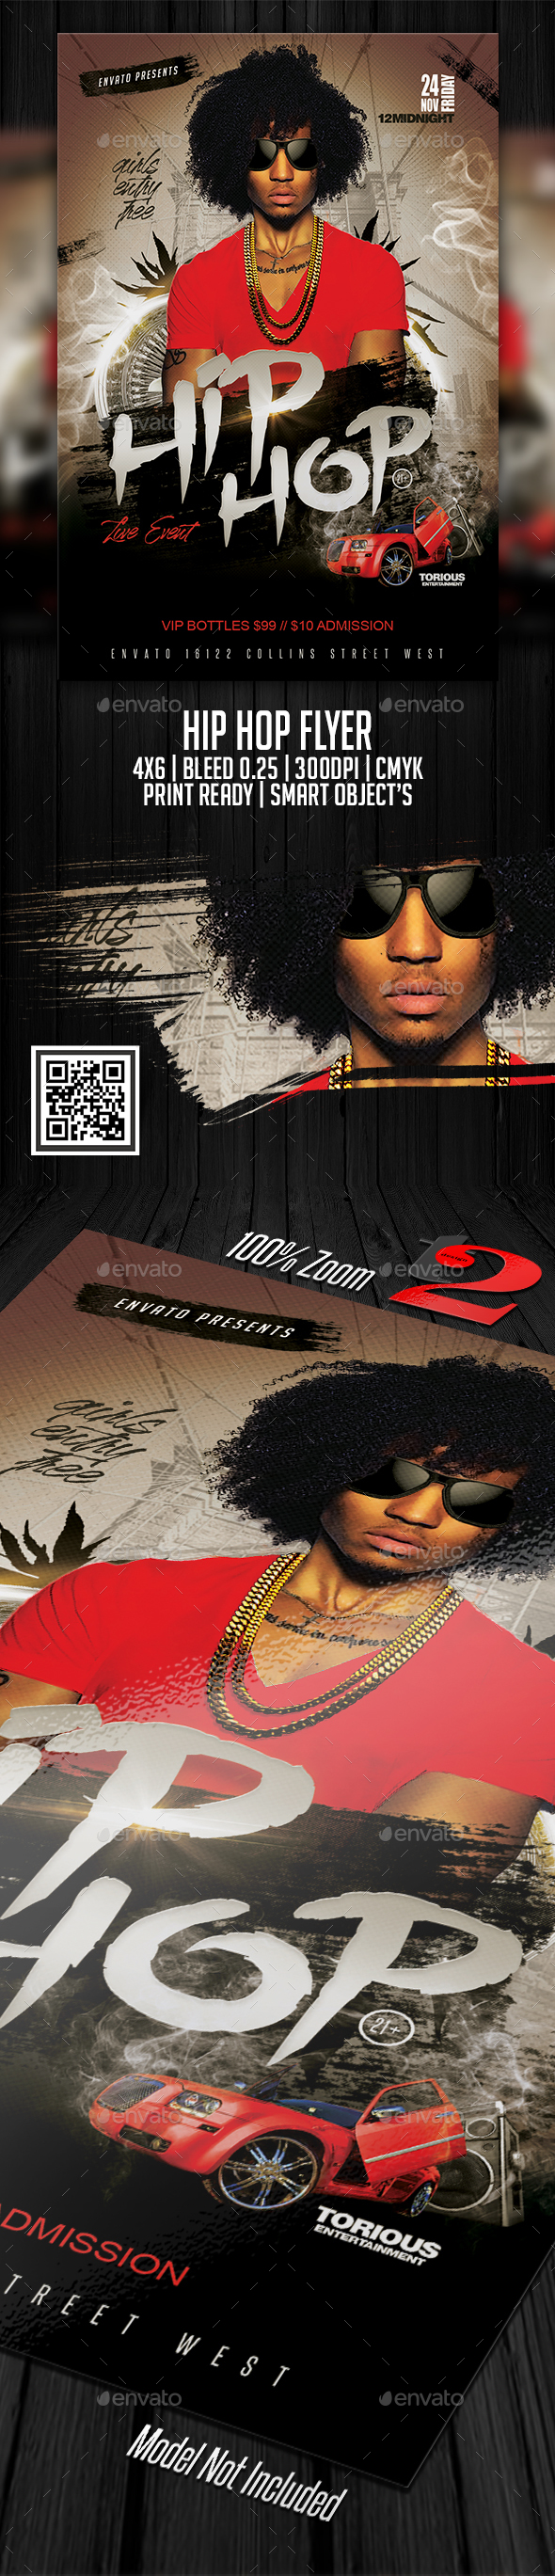 Hip Hop Flyer Template - Clubs & Parties Events